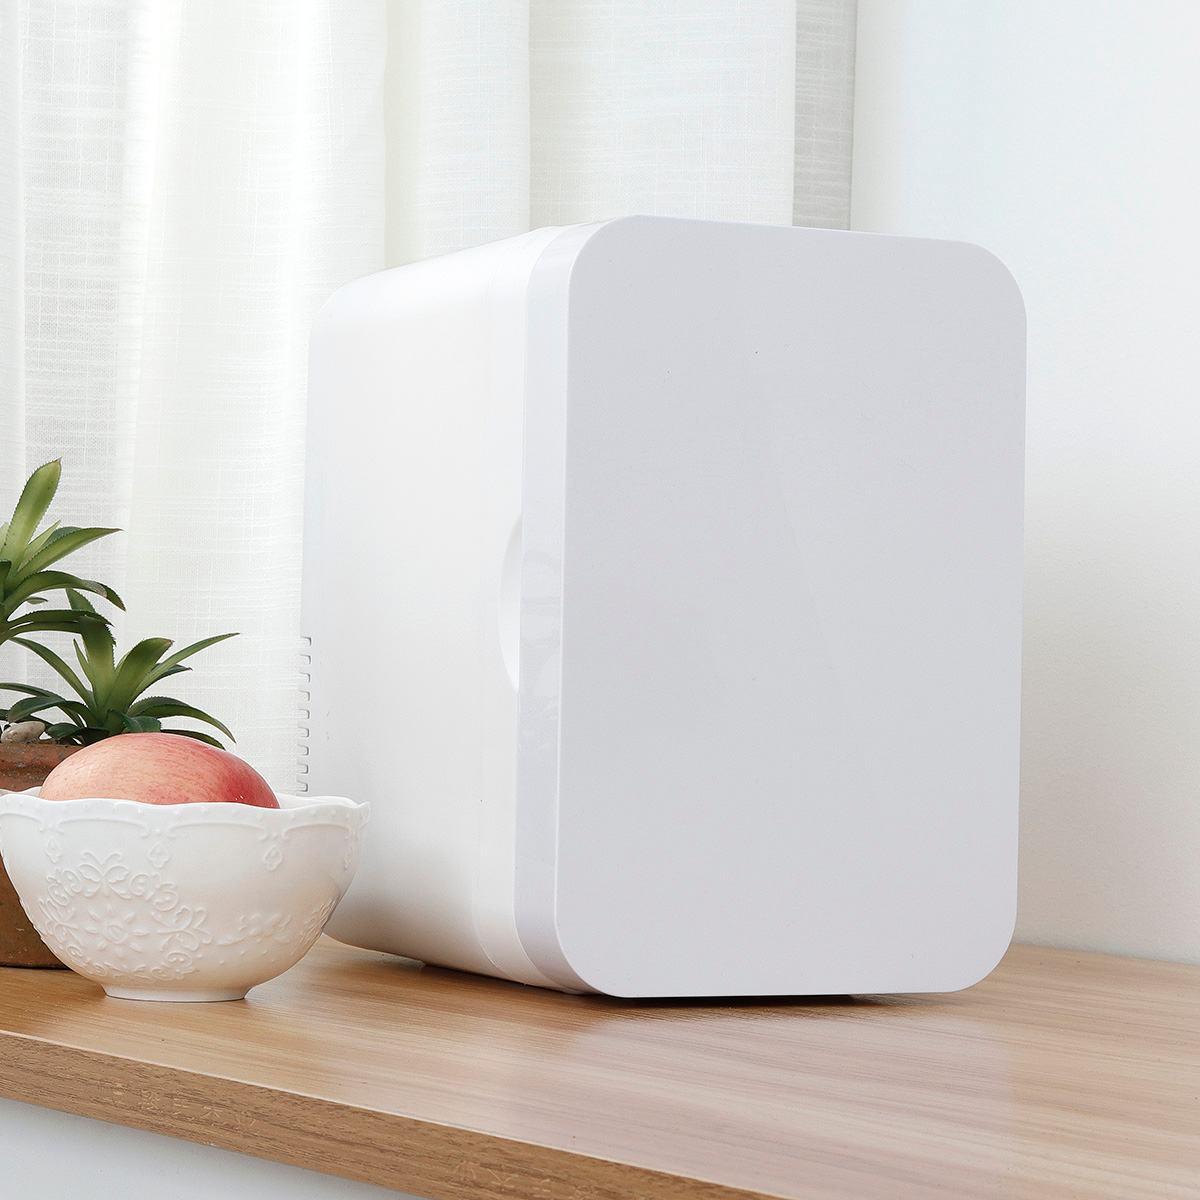 AUGIENB 6L Refrigerator Small Household Single Door Home Refrigerator 24V 12V